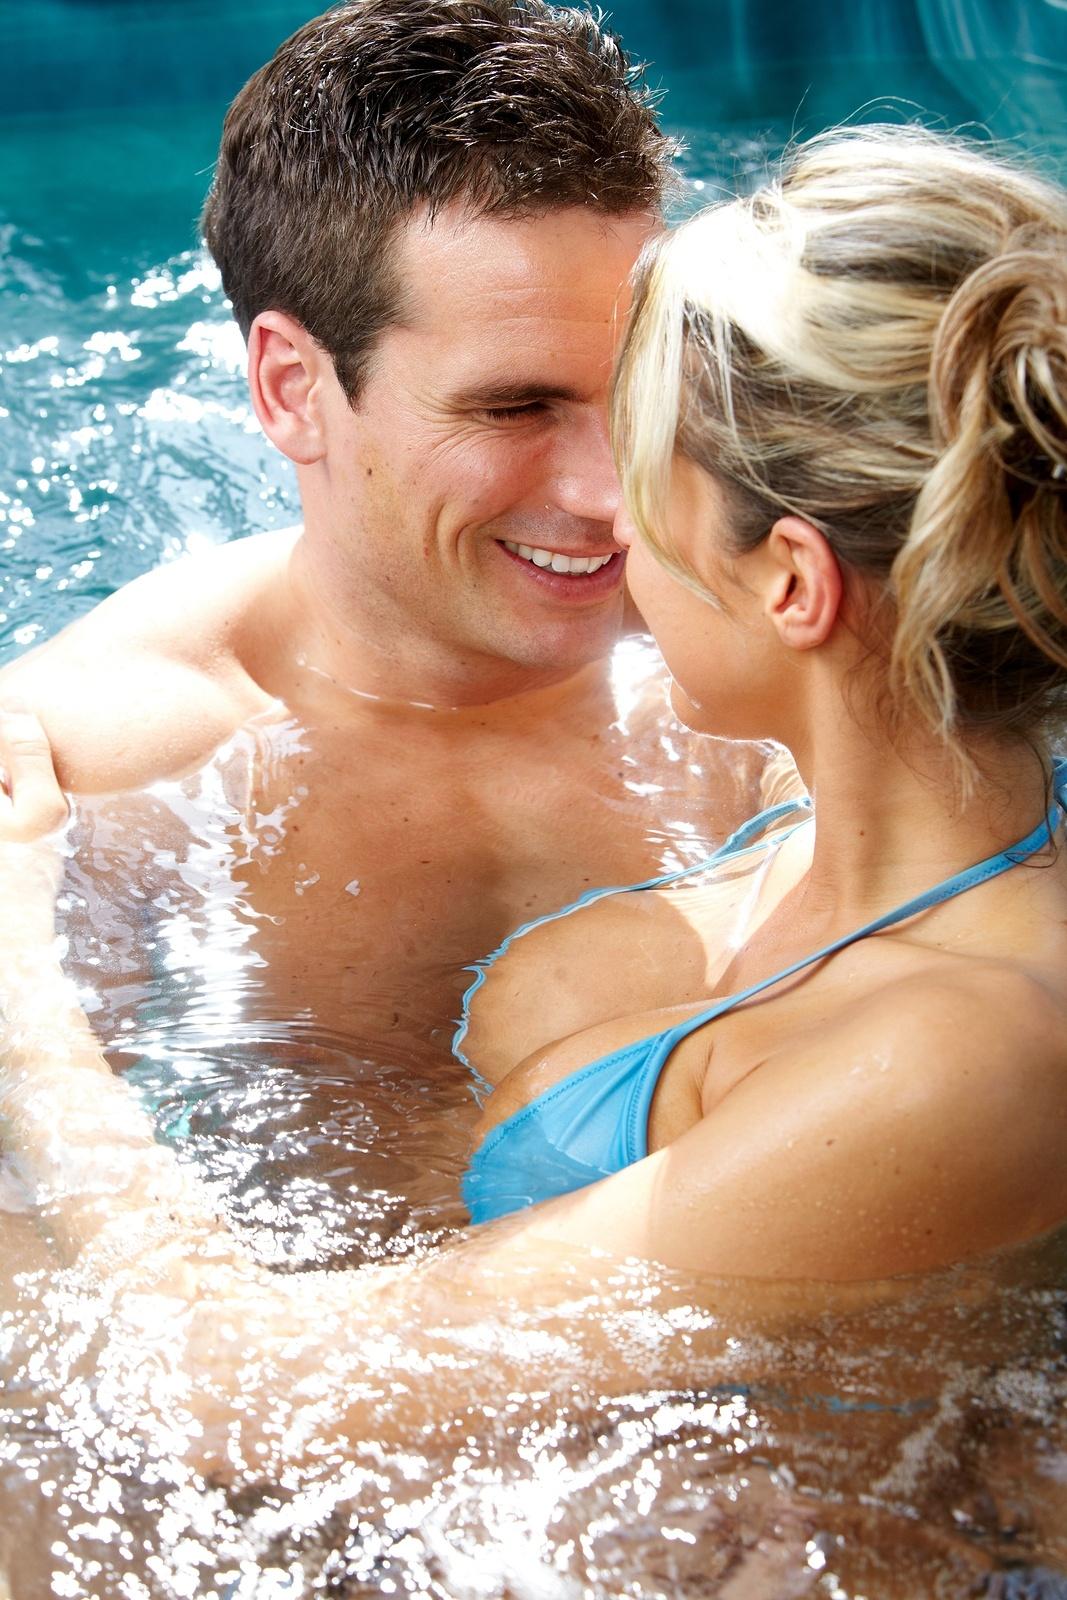 bigstock-Young-couple-relaxing-in-hot-t-88606304.jpg